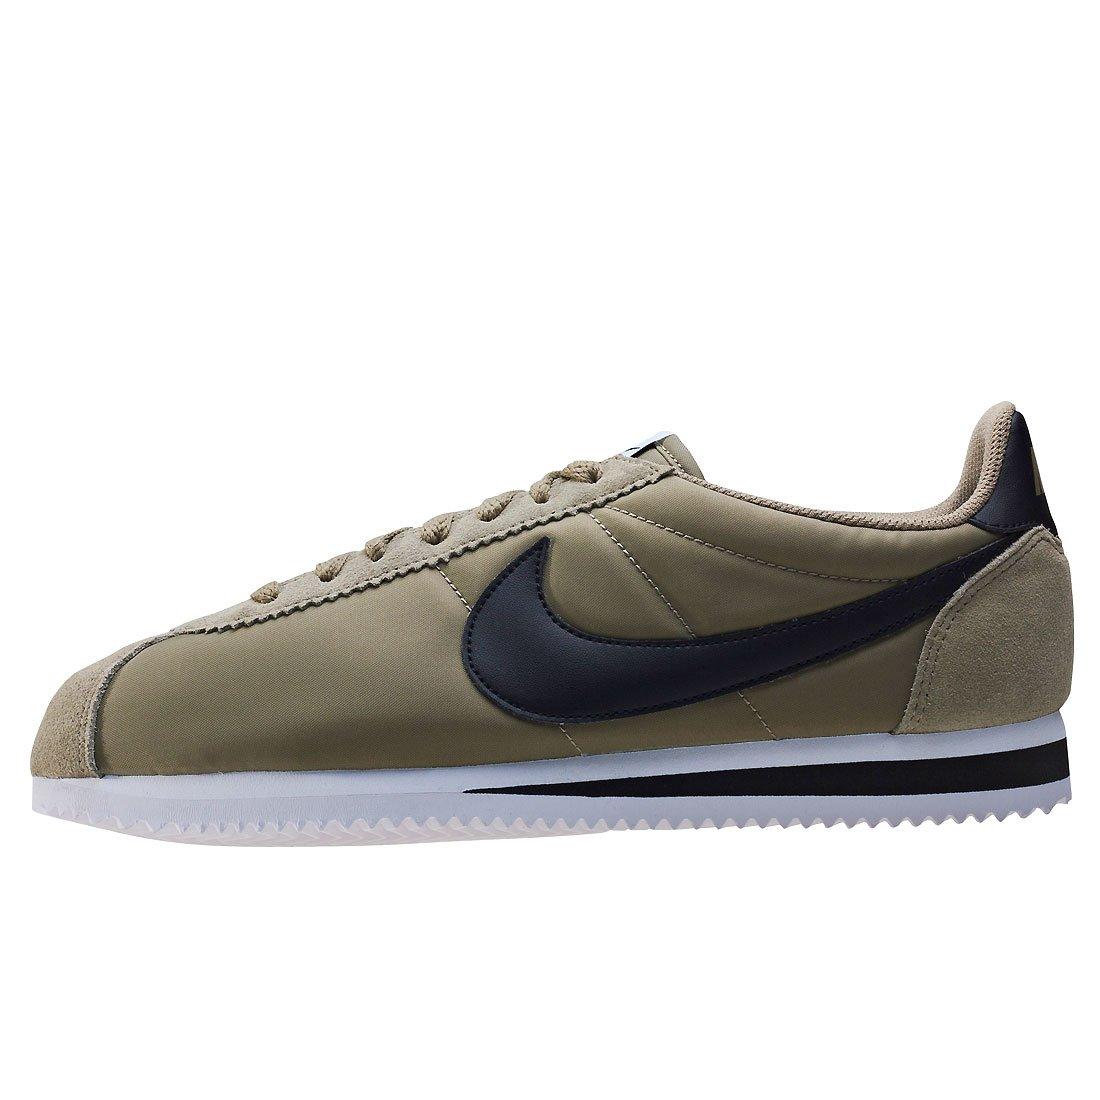 quality design c985d 87fa3 Nike Classic Cortez Nylon Mens Trainers  Amazon.co.uk  Shoes   Bags